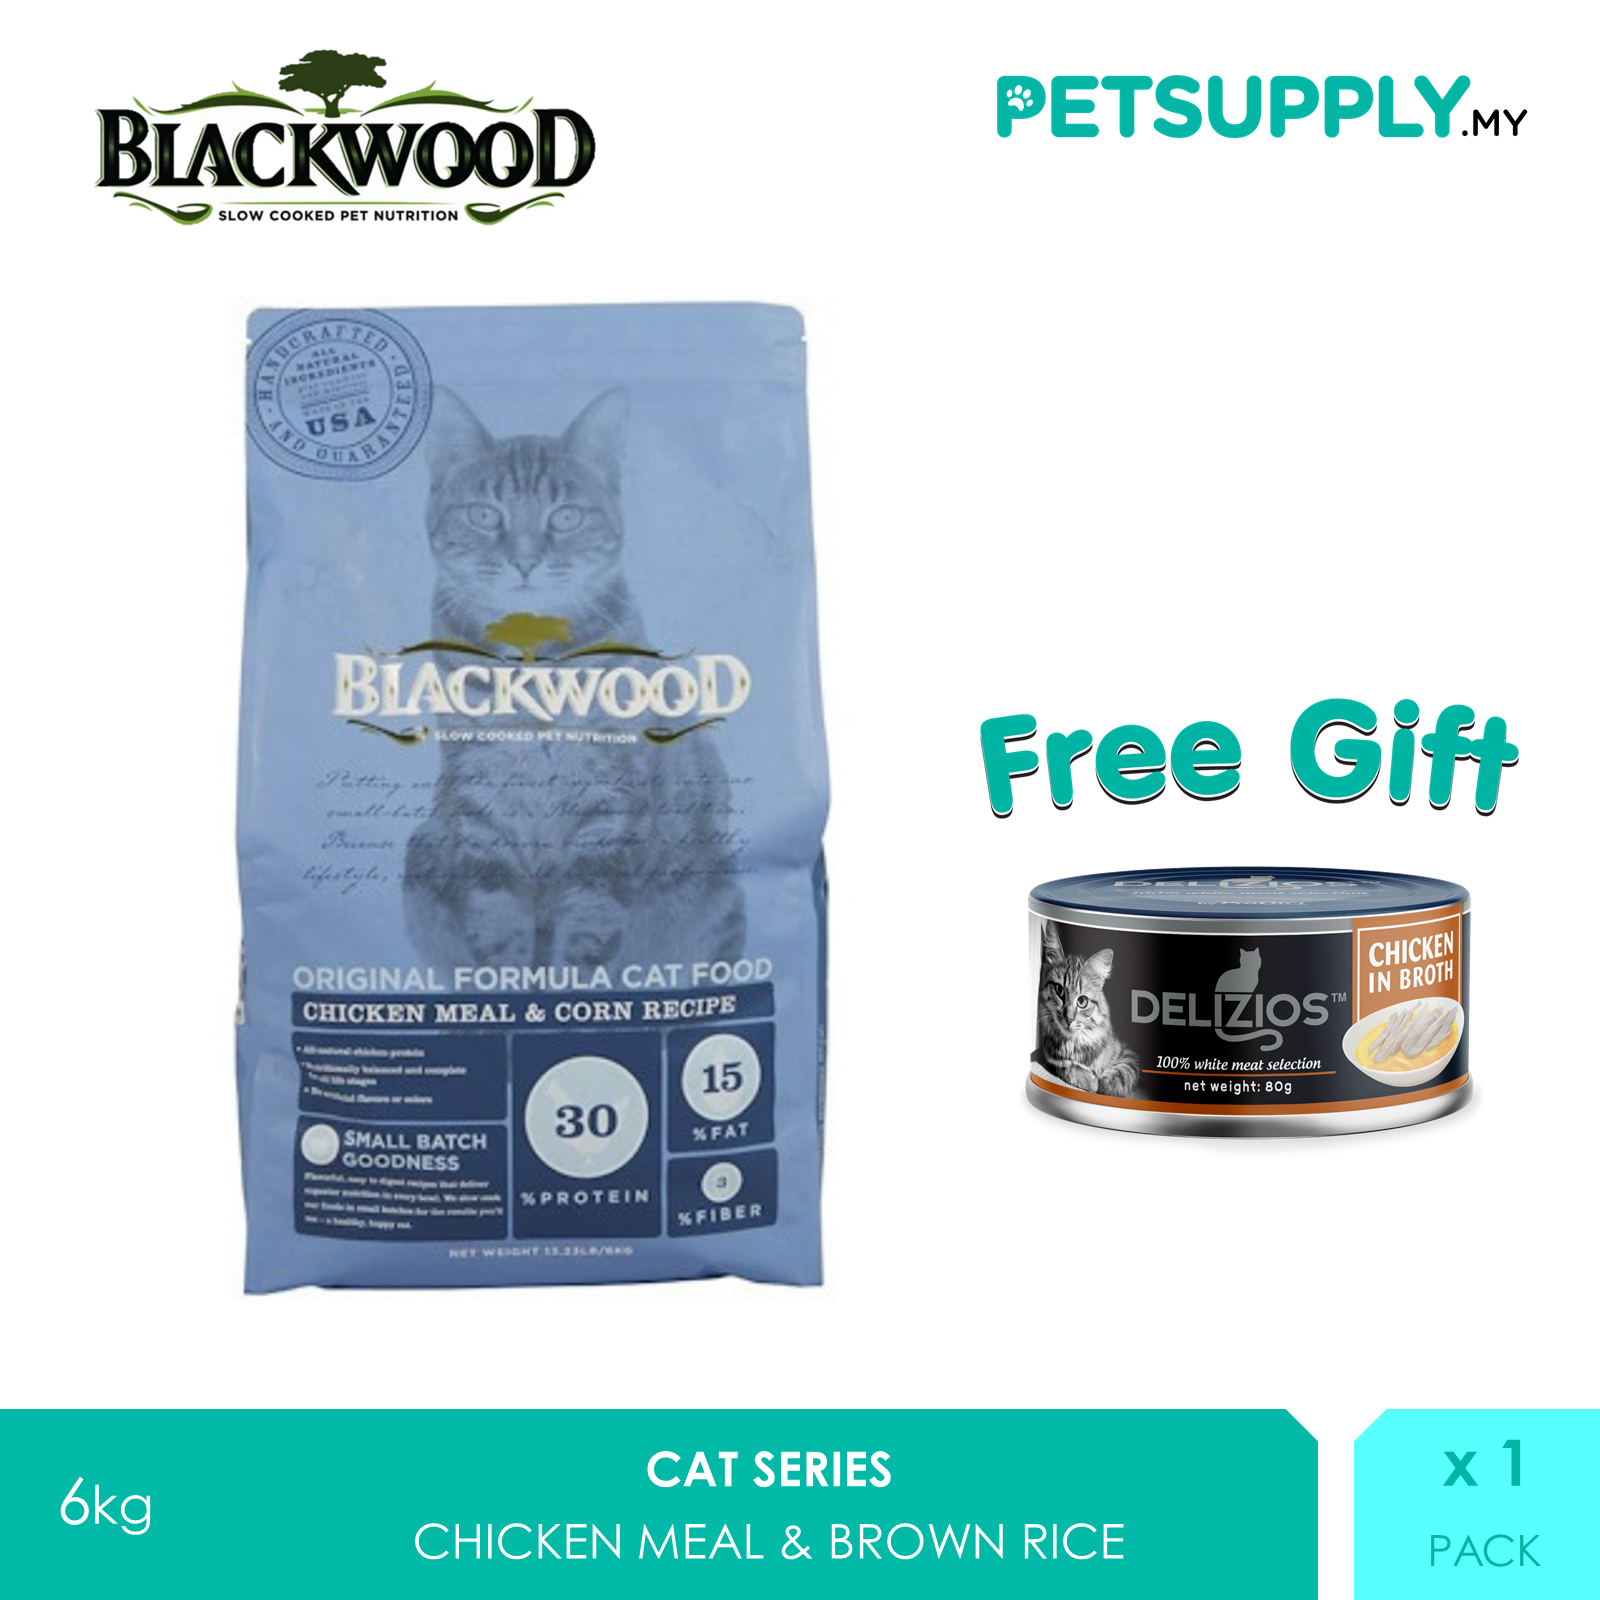 Buy 1 Free 2! Blackwood Original Formula Cat Food Chicken Meal & Brown Rice Recipe 6kg [makanan kucing - Petsupply.my]